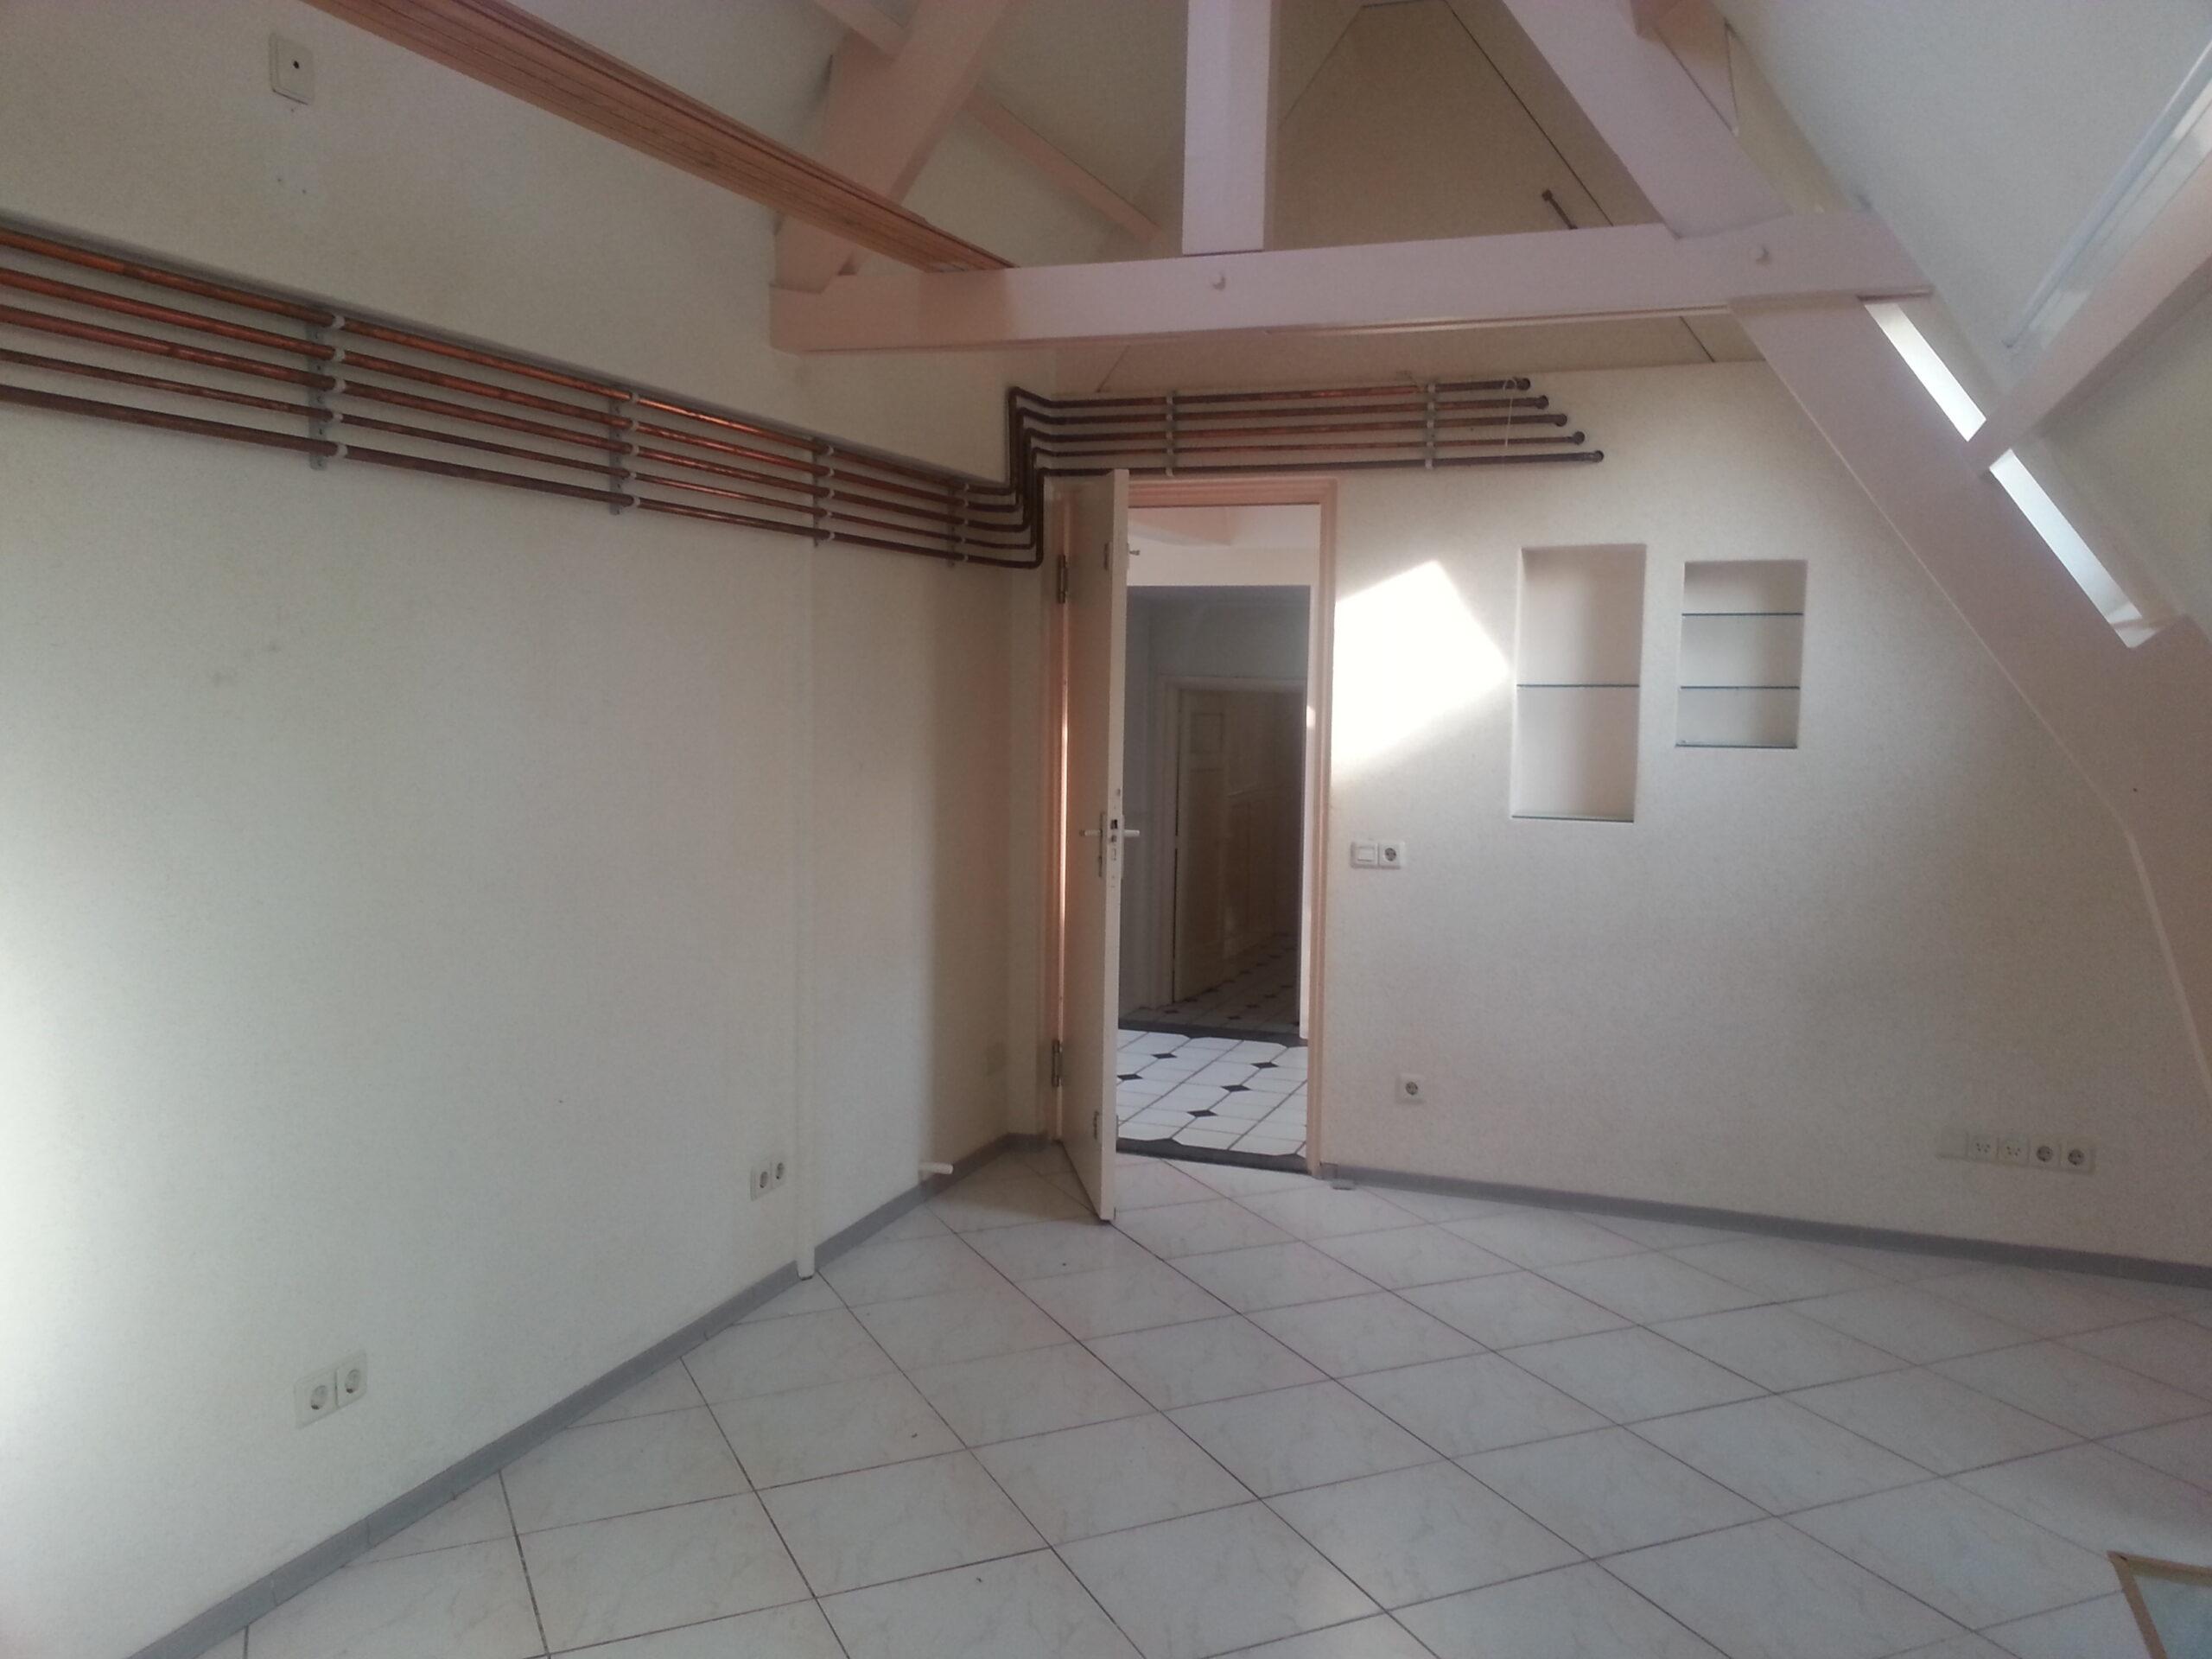 Te huur appartement Burggang 5 te Middelburg (Centrum)